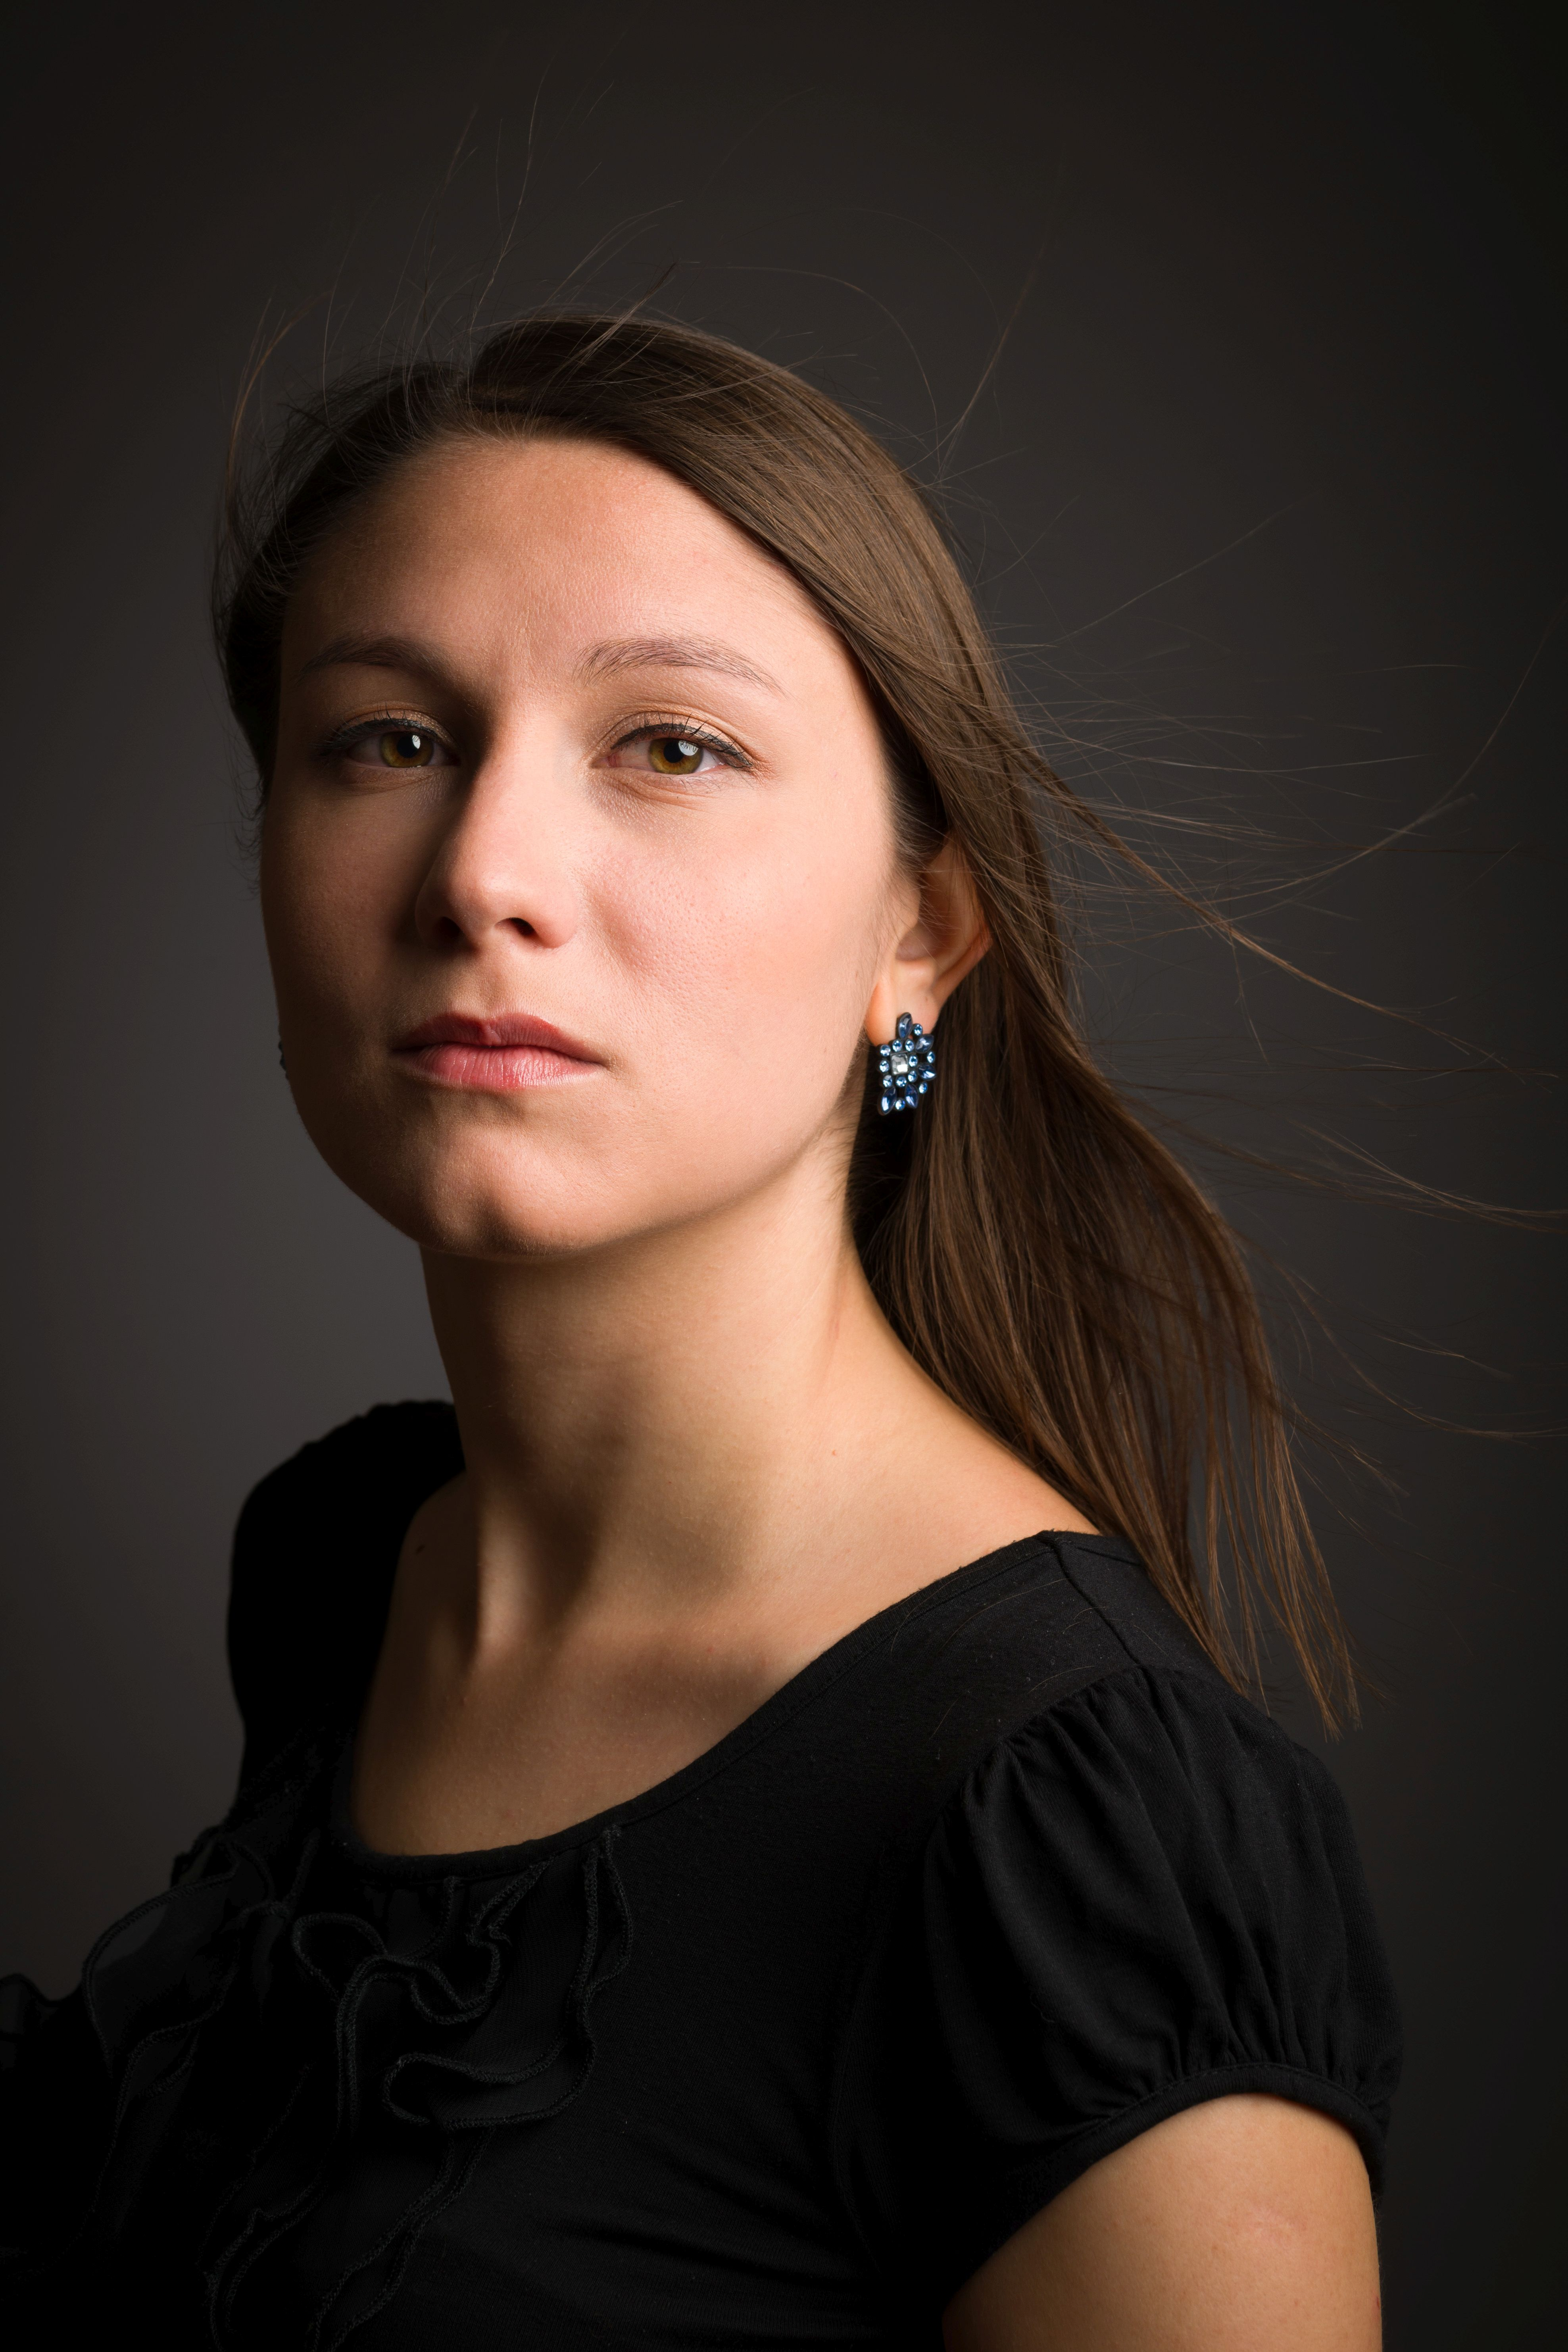 Klavirski recital: Meta Fajdiga | Glasbena šola Nova Gorica